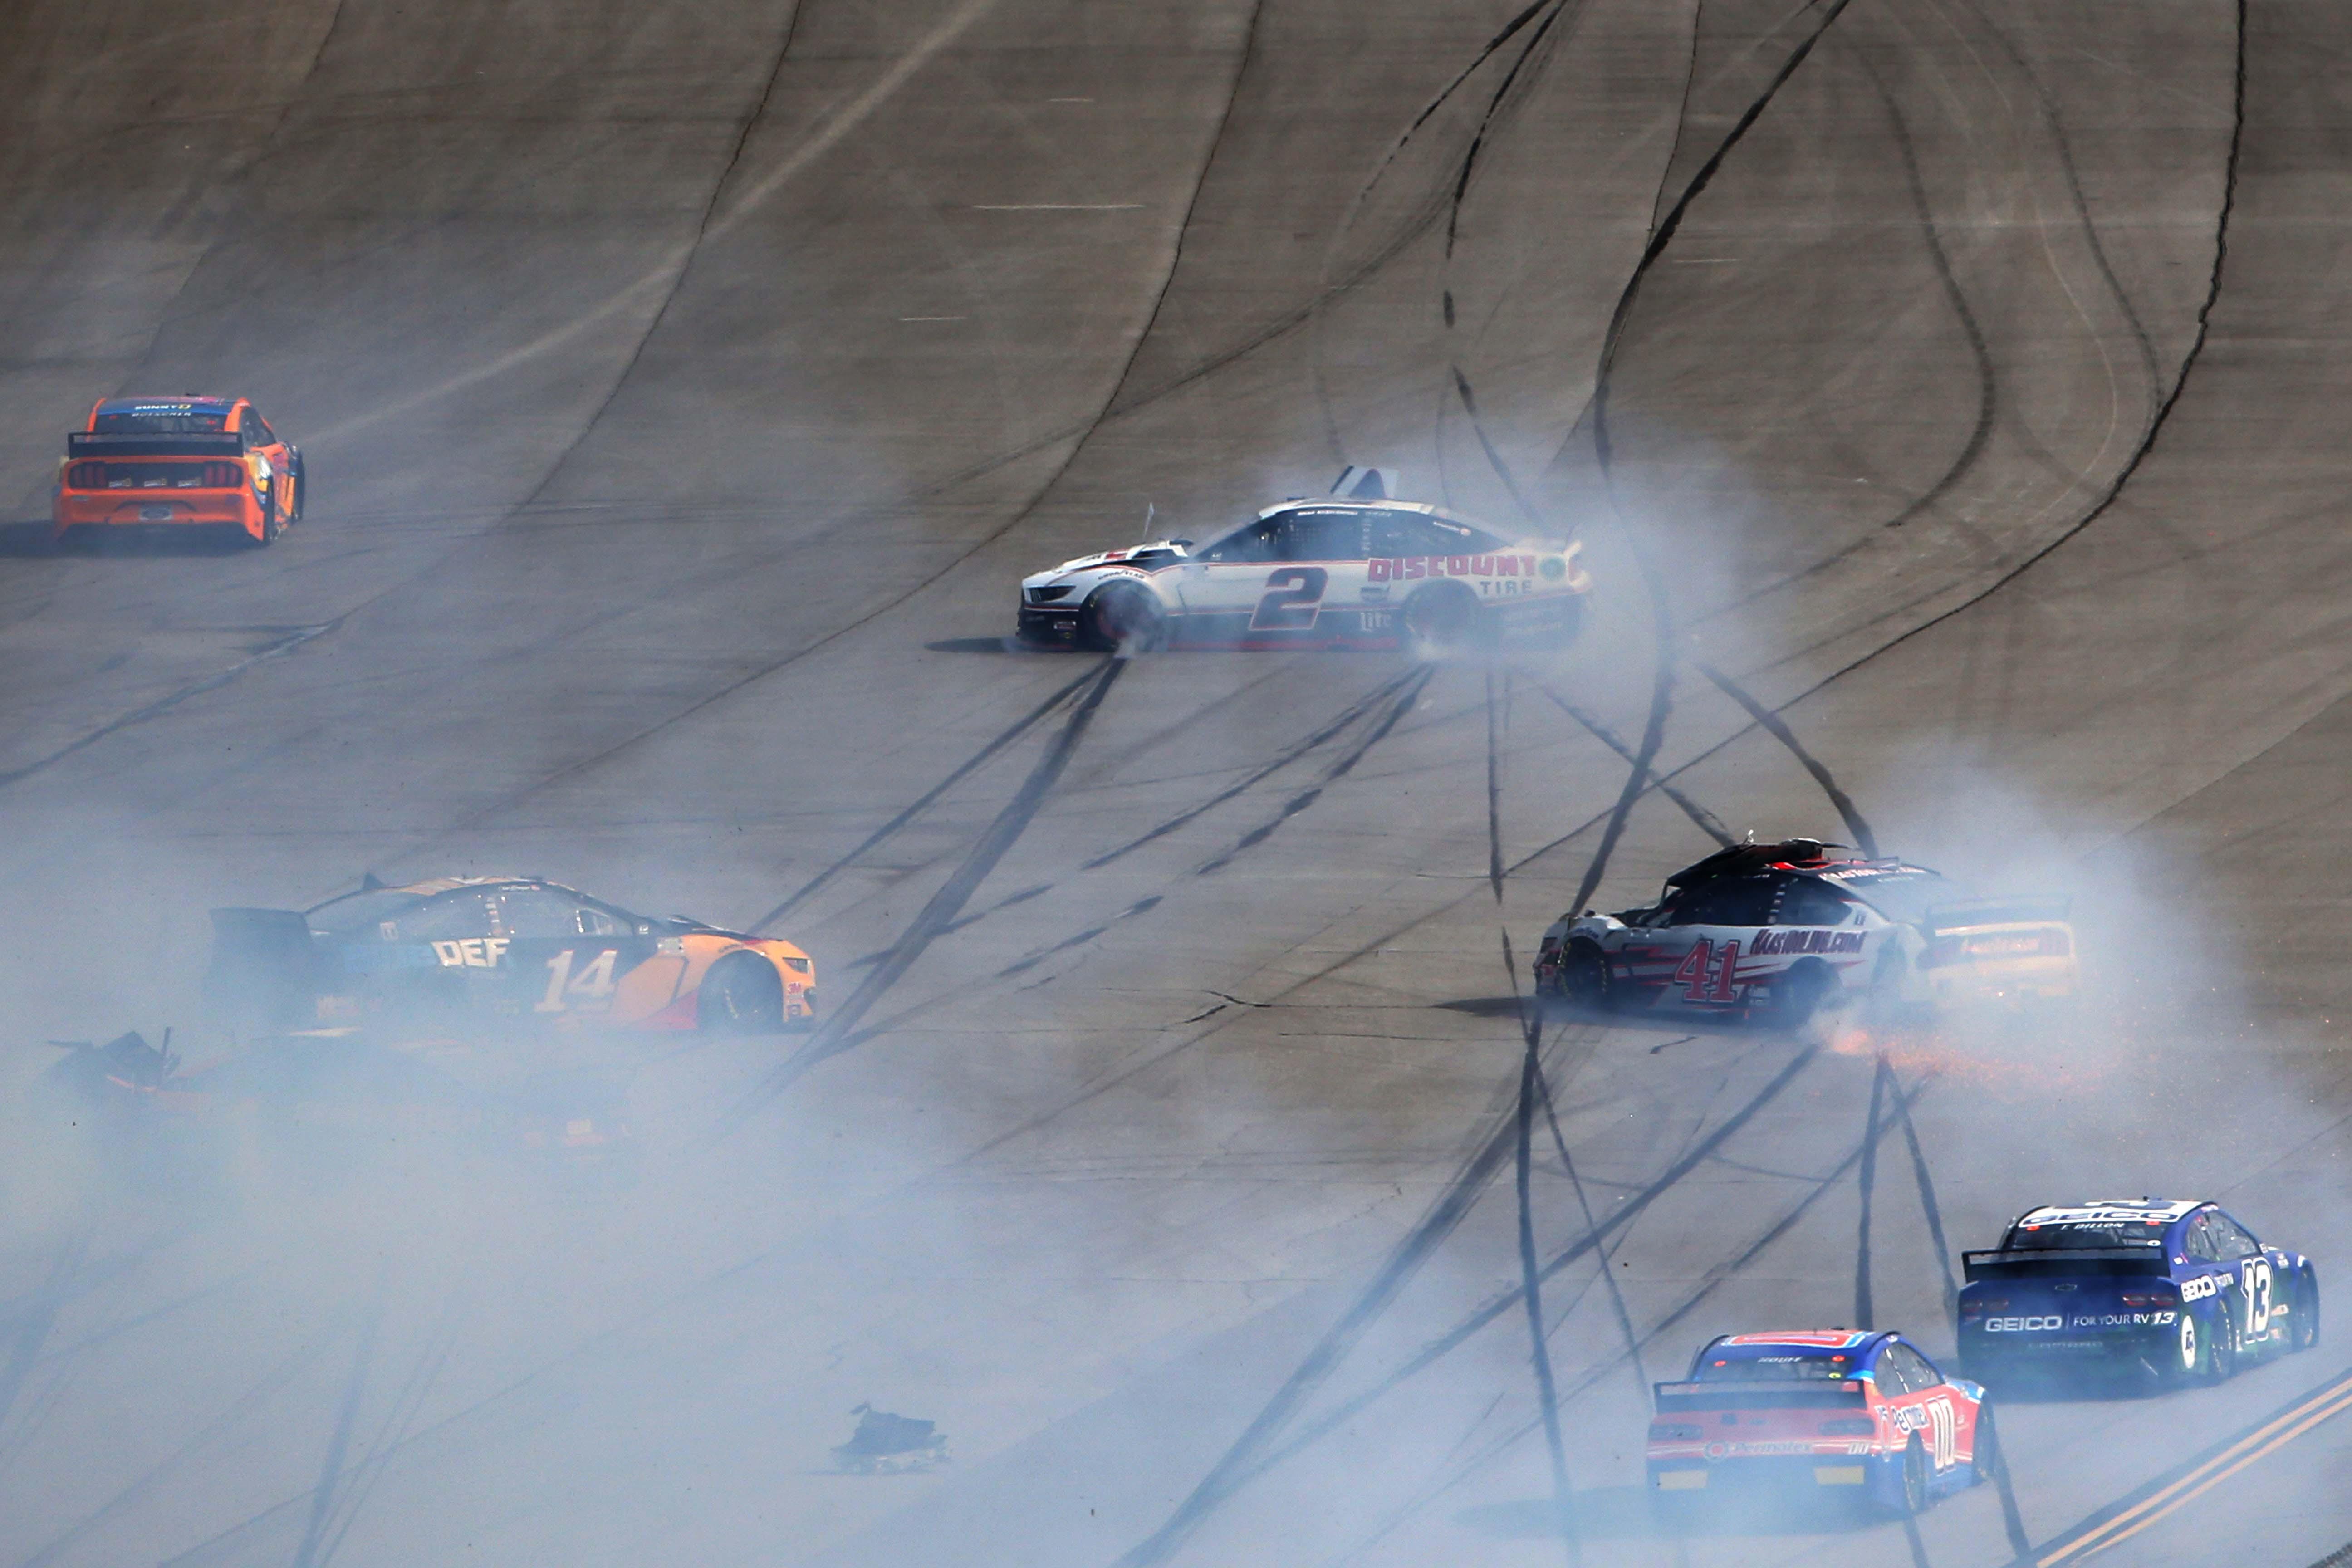 Clint Bowyer and Brad Keselowski crash at Talladega Superspeedway - NASCAR Cup Series